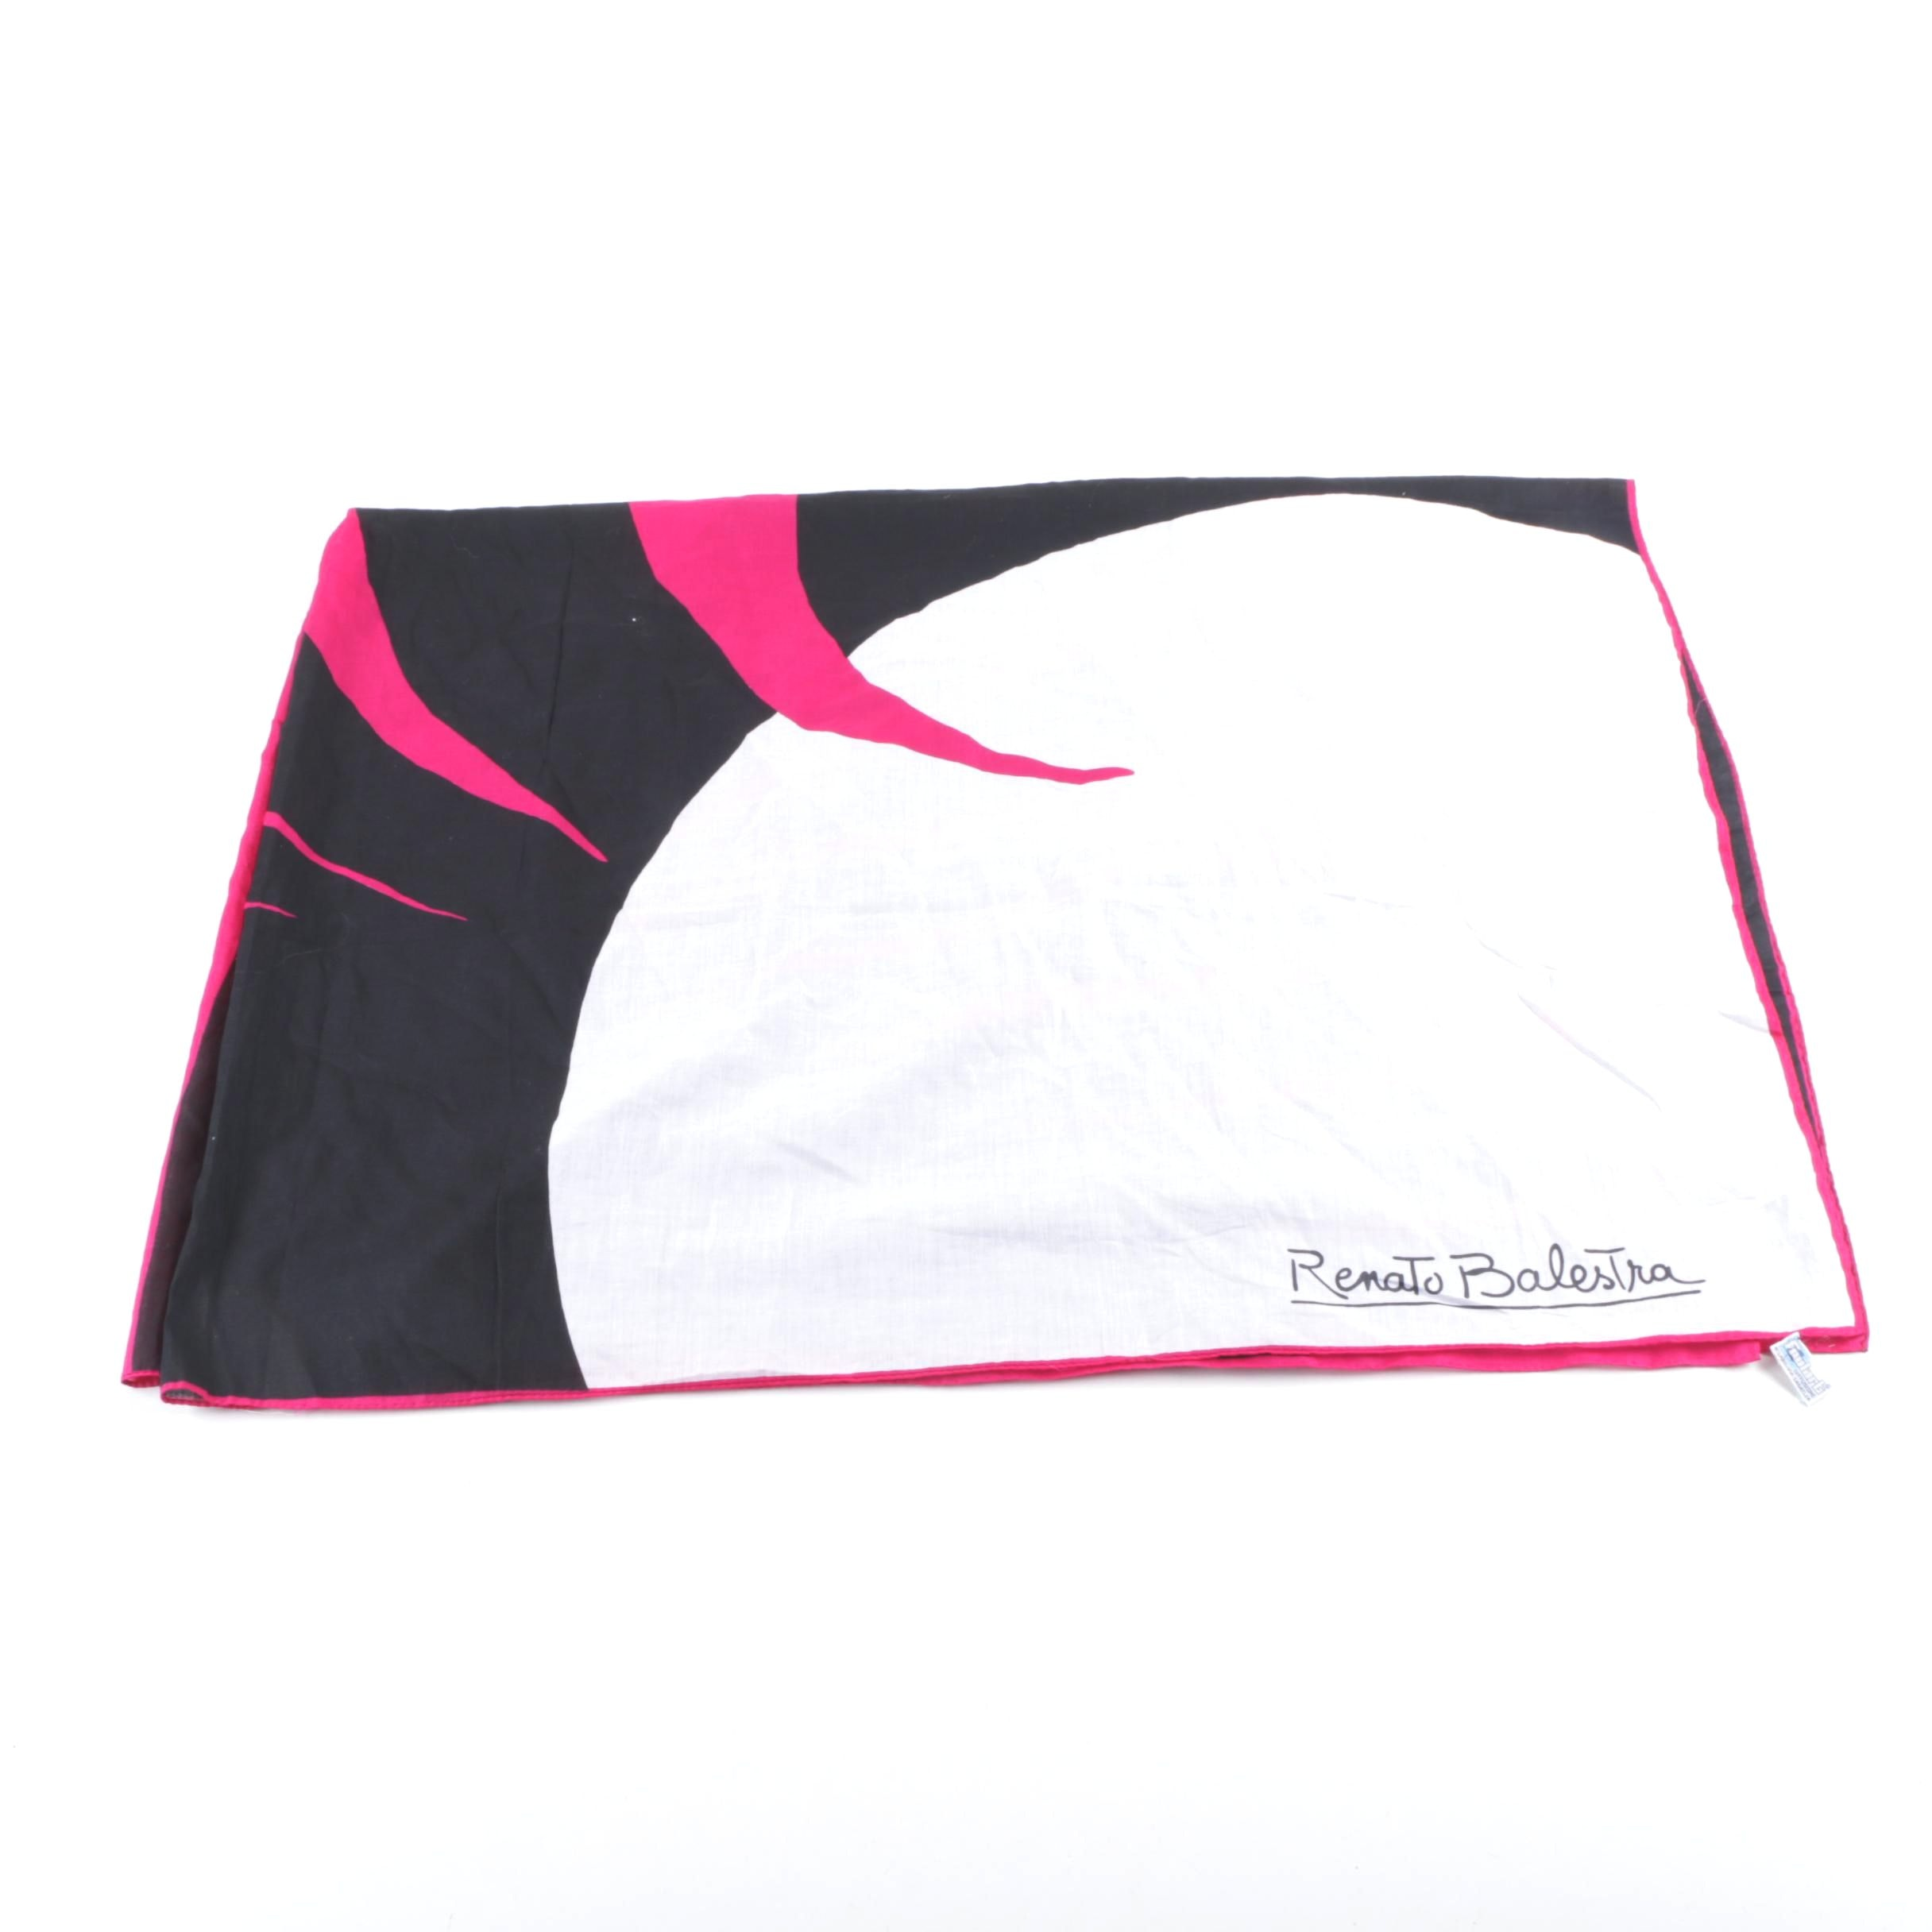 Vintage Renato Balestra Large Pink, Black and White Geometric Print Cotton Scarf